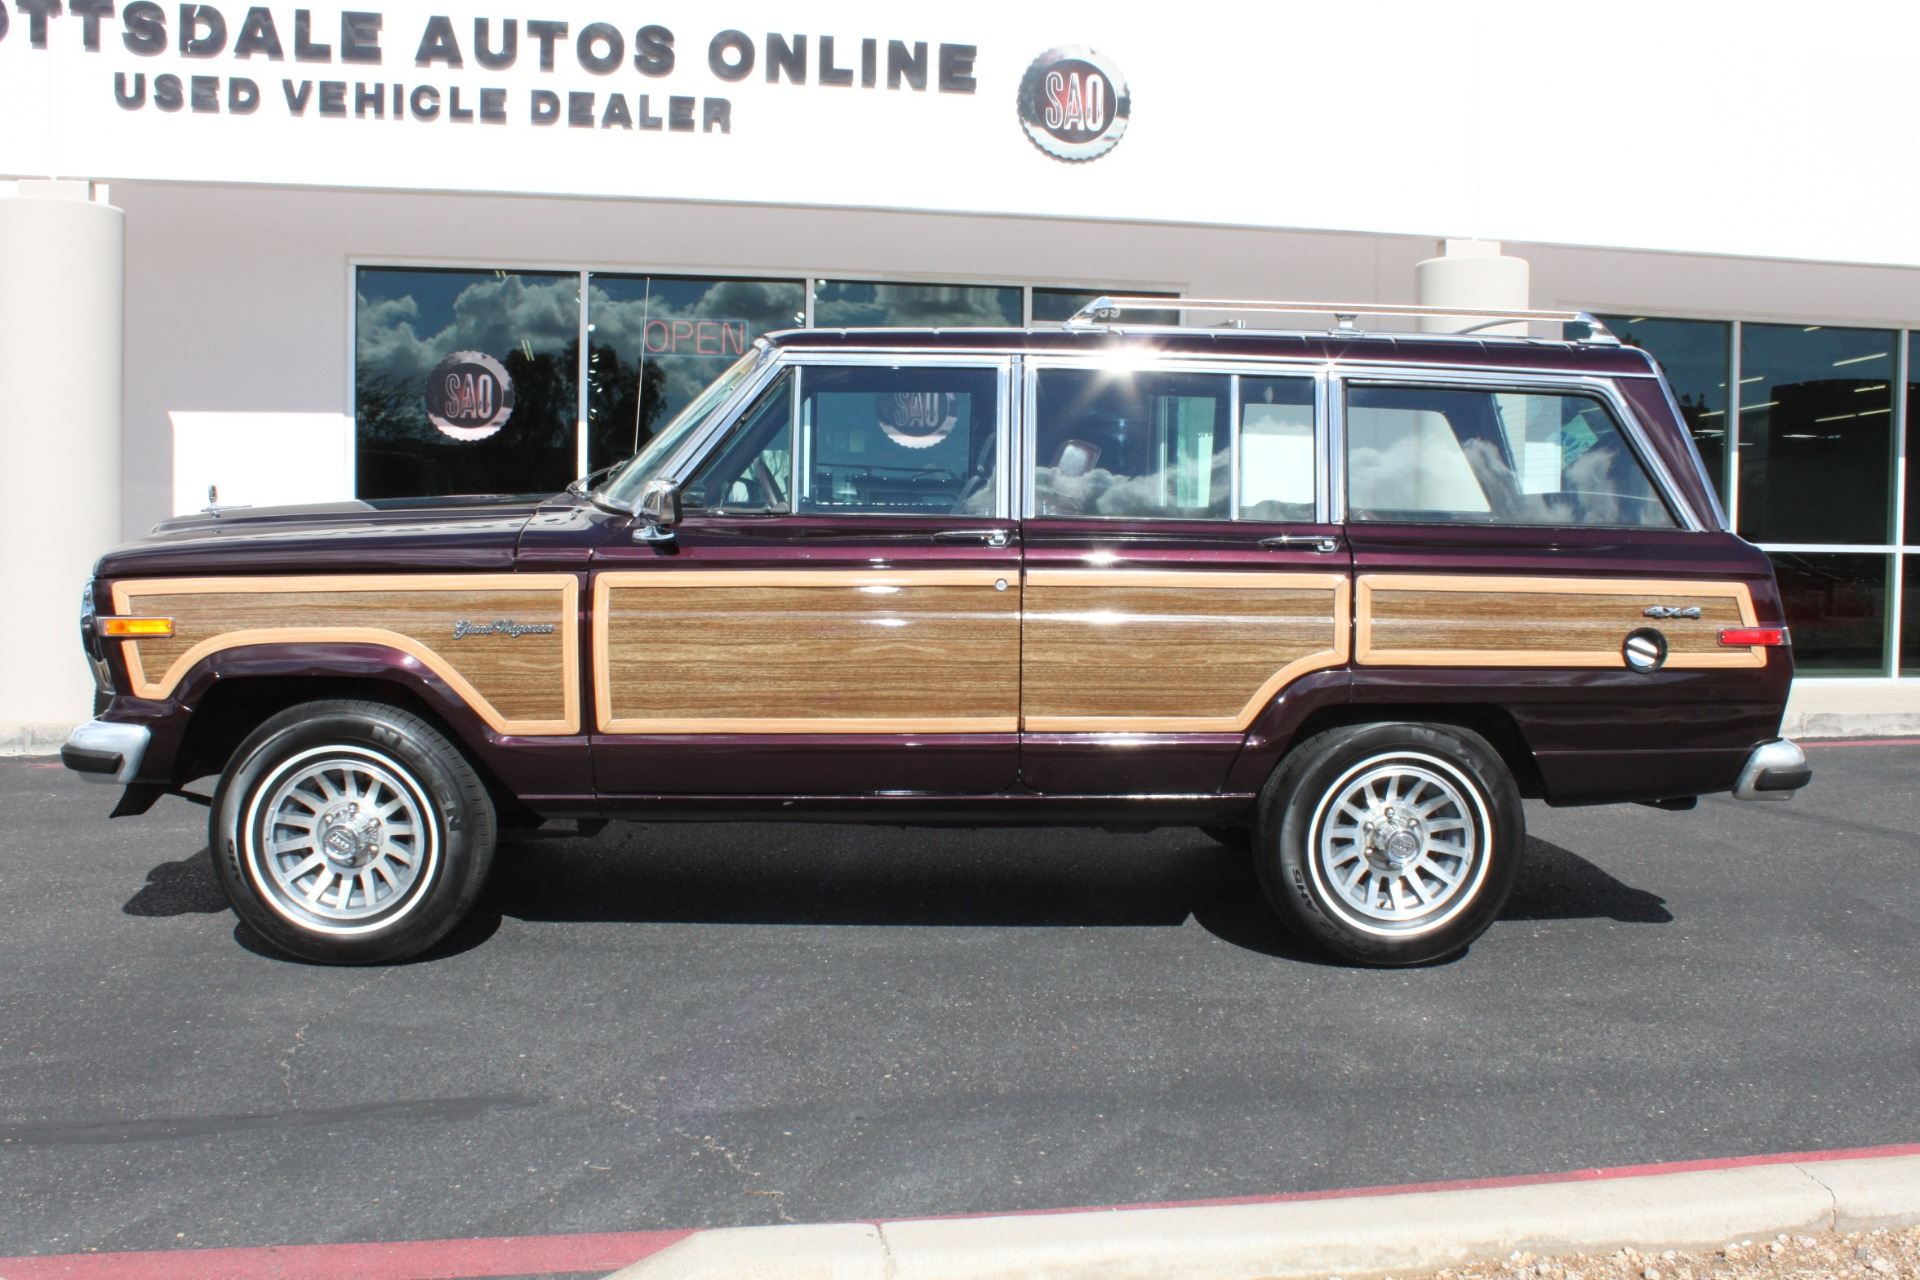 Used-1989-Jeep-Grand-Wagoneer-Wagoneer